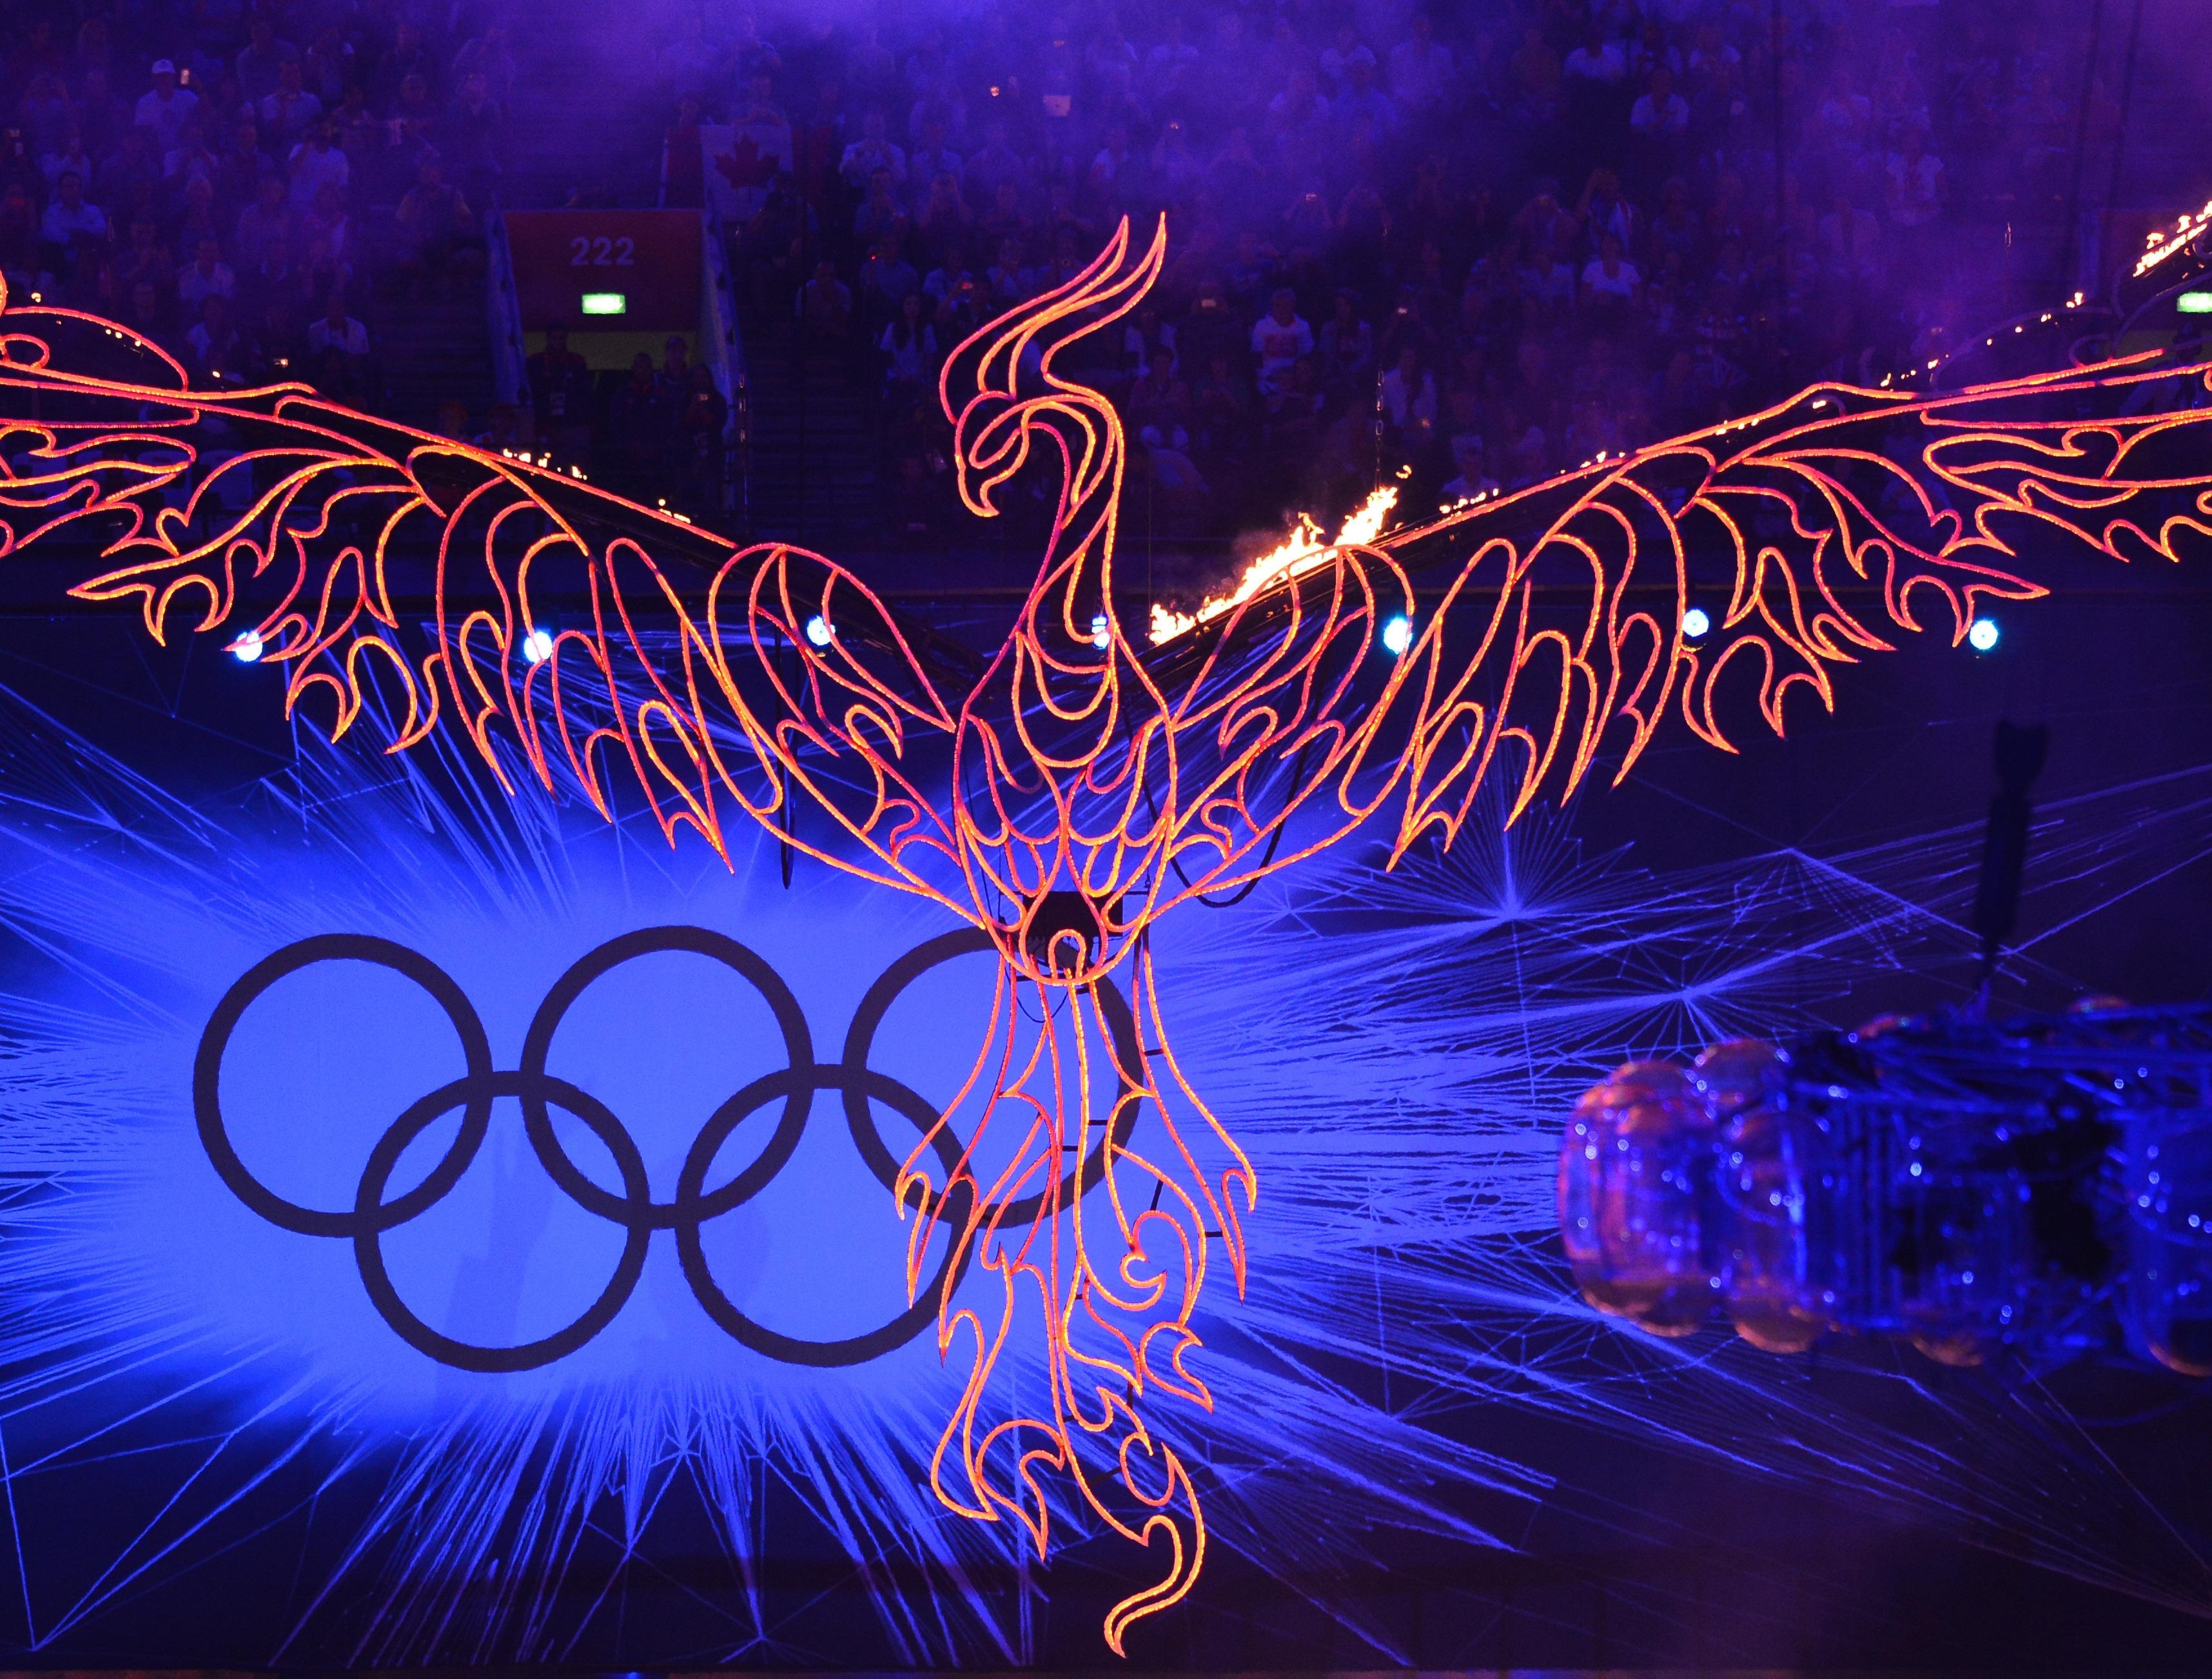 когда будет летняя олимпиада в азербайджане